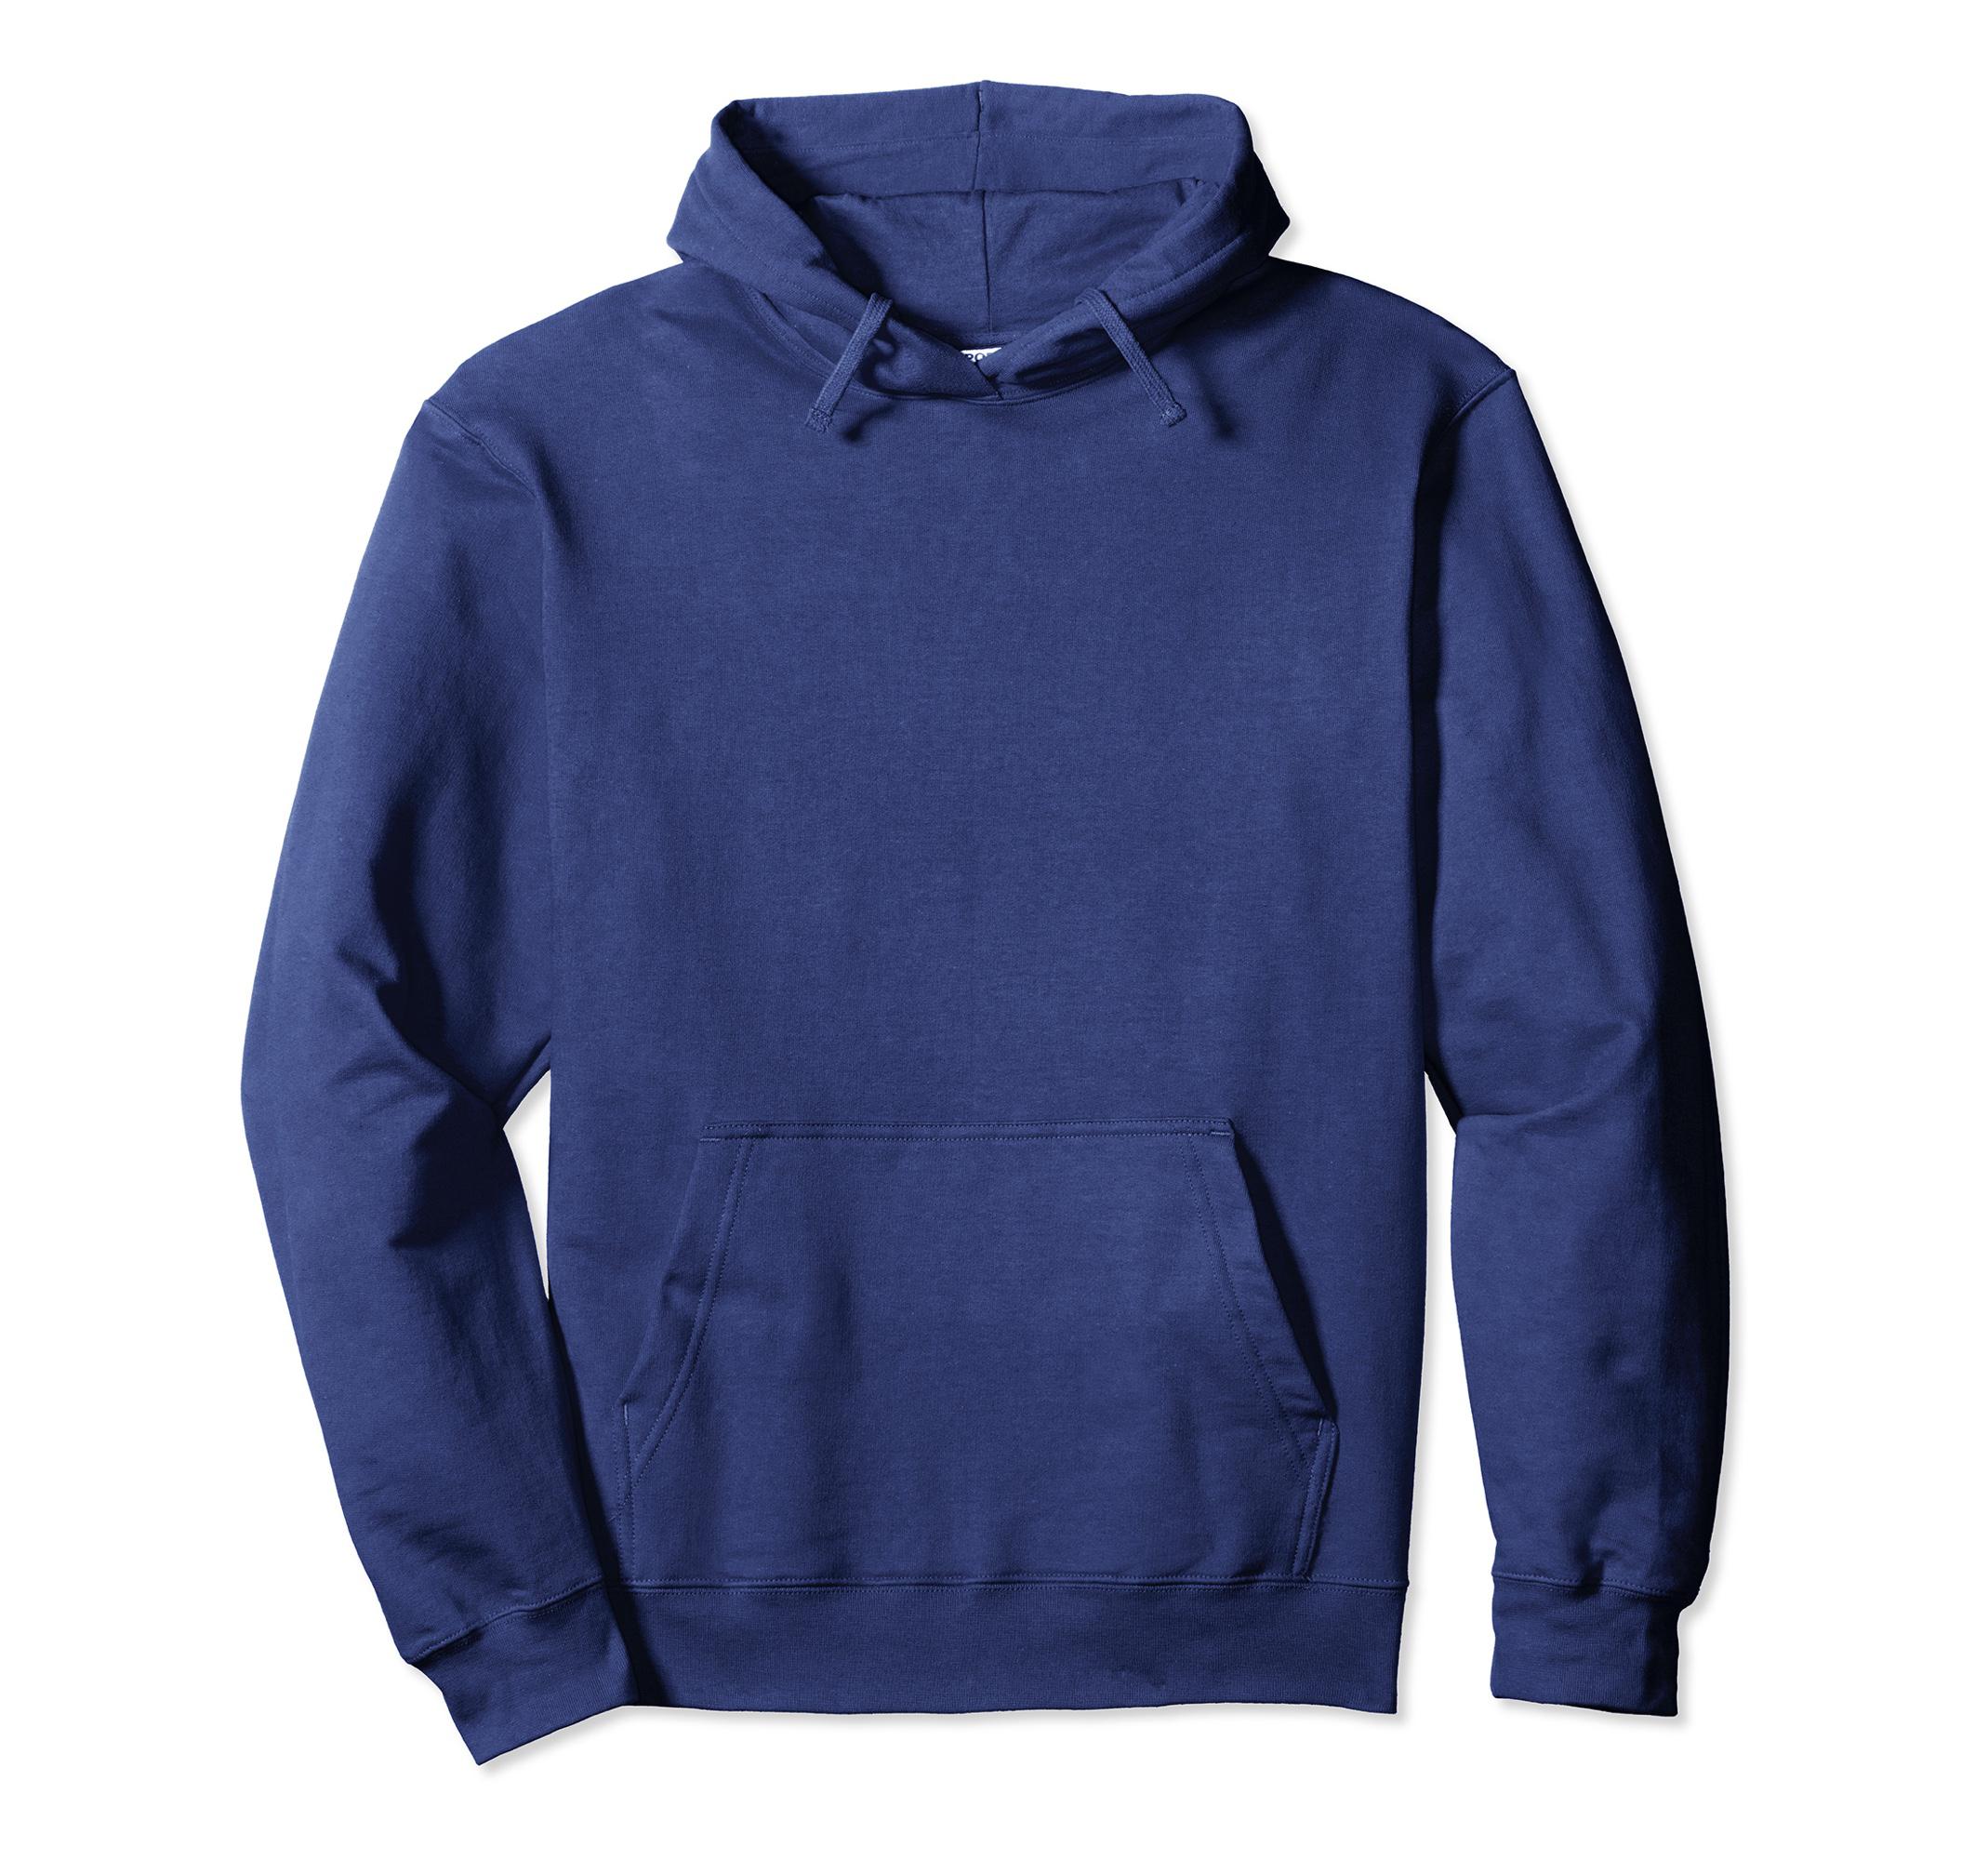 Male Nurses Know Where To Stick It Funny Gift For Nurse Sweatshirt